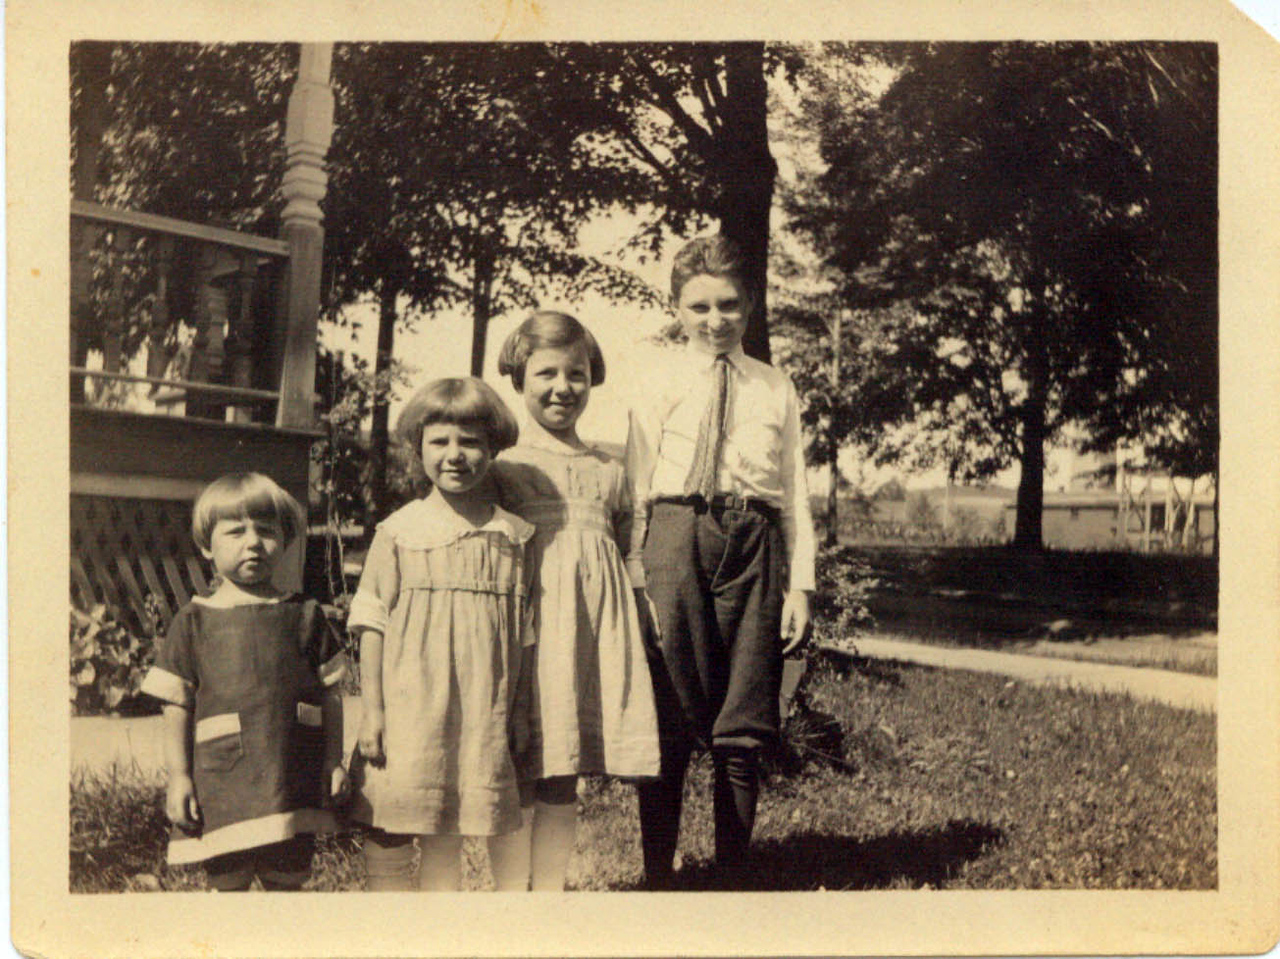 Helen, Winn, Wilma and Harold Wolff